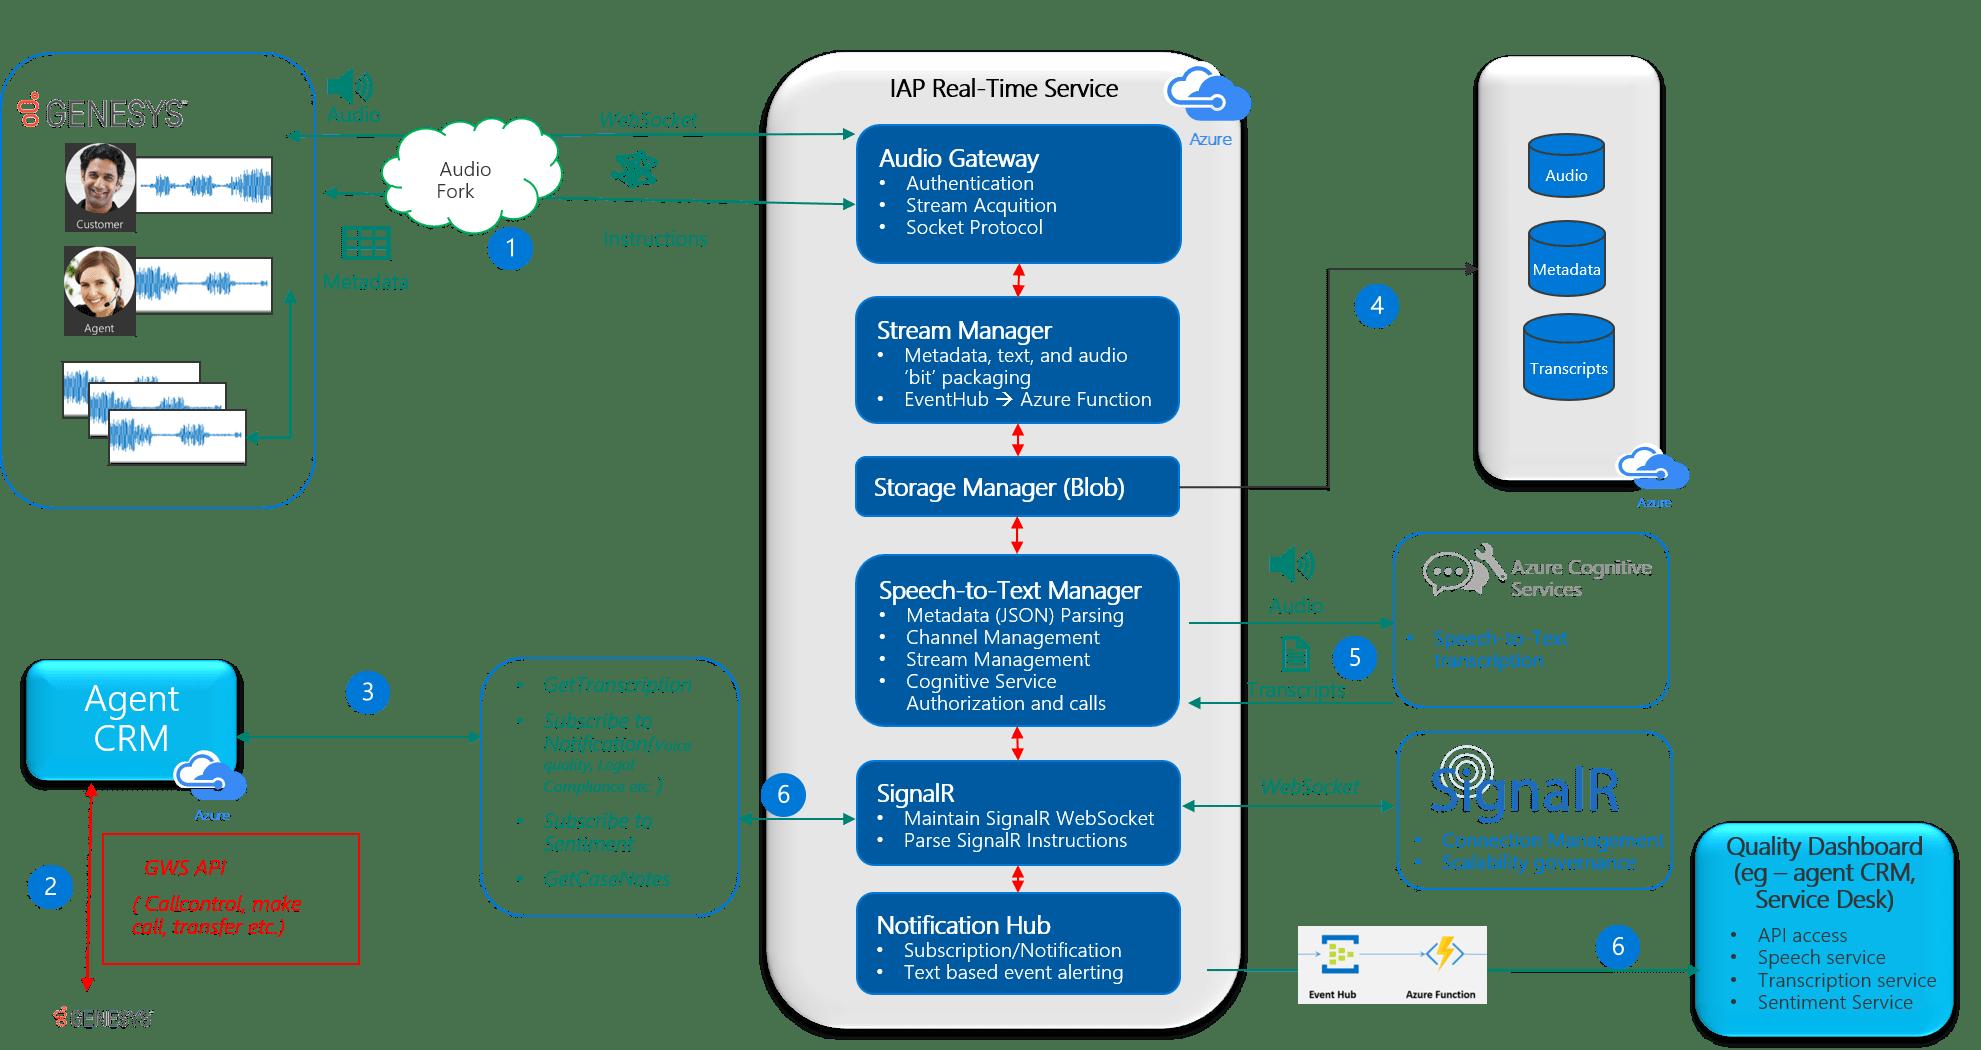 Call Center Transcription - Speech Service - Azure Cognitive